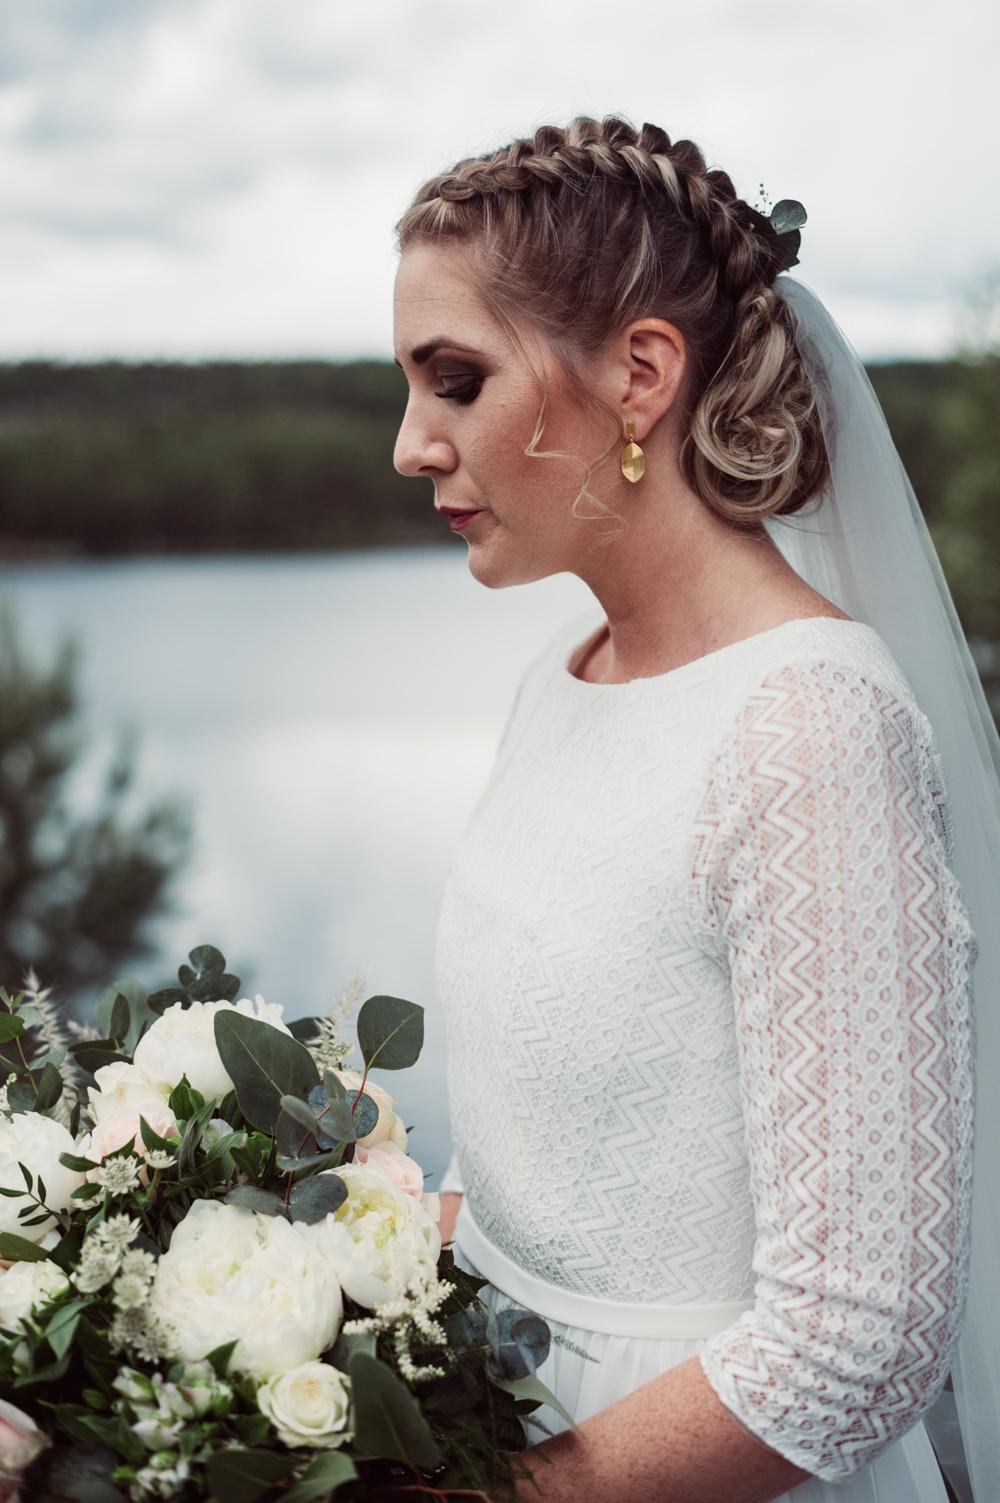 Bride Bridal Make Up Hair Style Up Do Plait Braid Norway Wedding Maximilian Photography